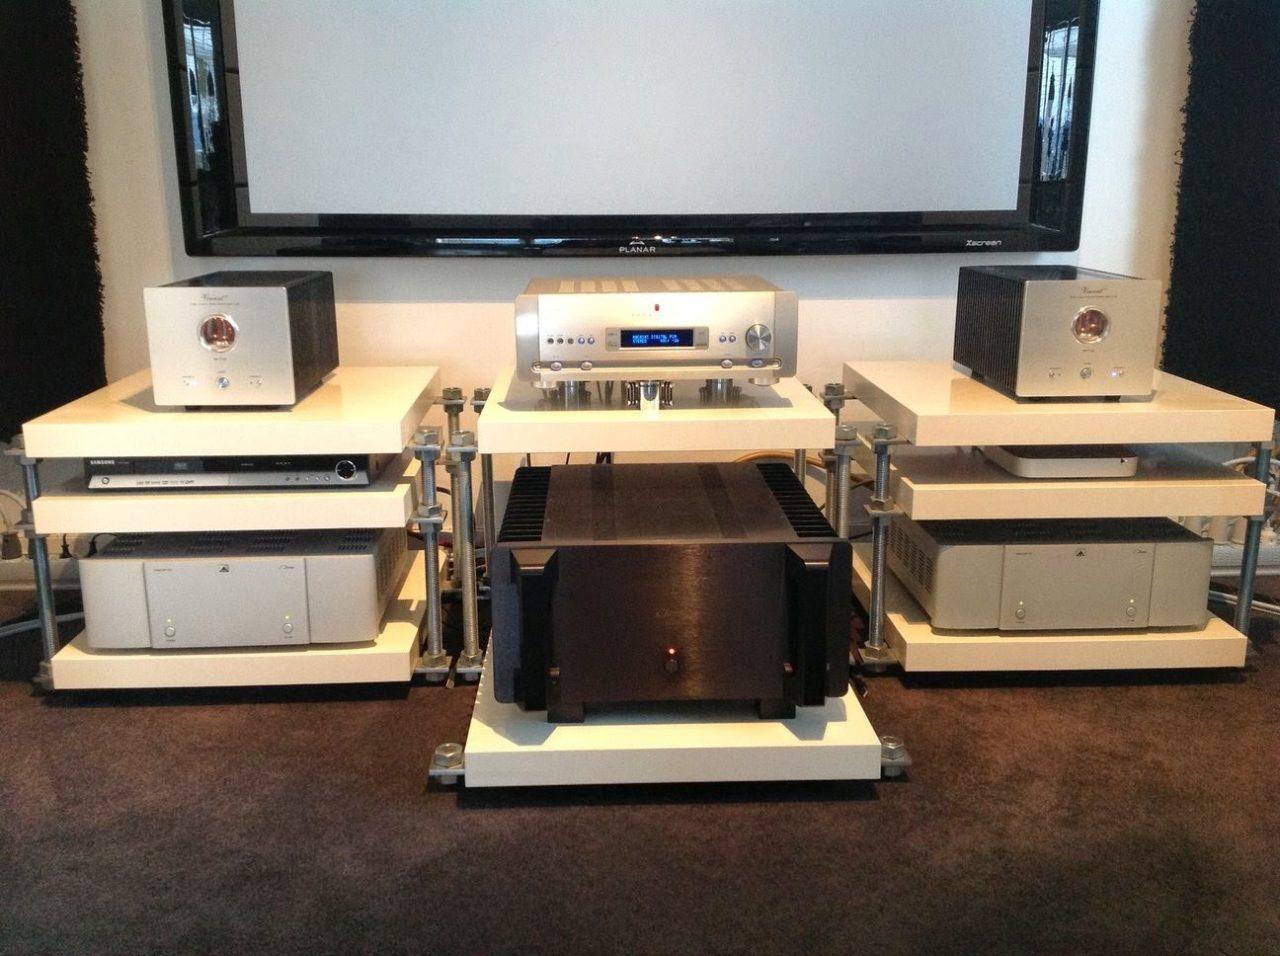 Seven cunning IKEA hacks for vinyl lovers - The Vinyl Factory